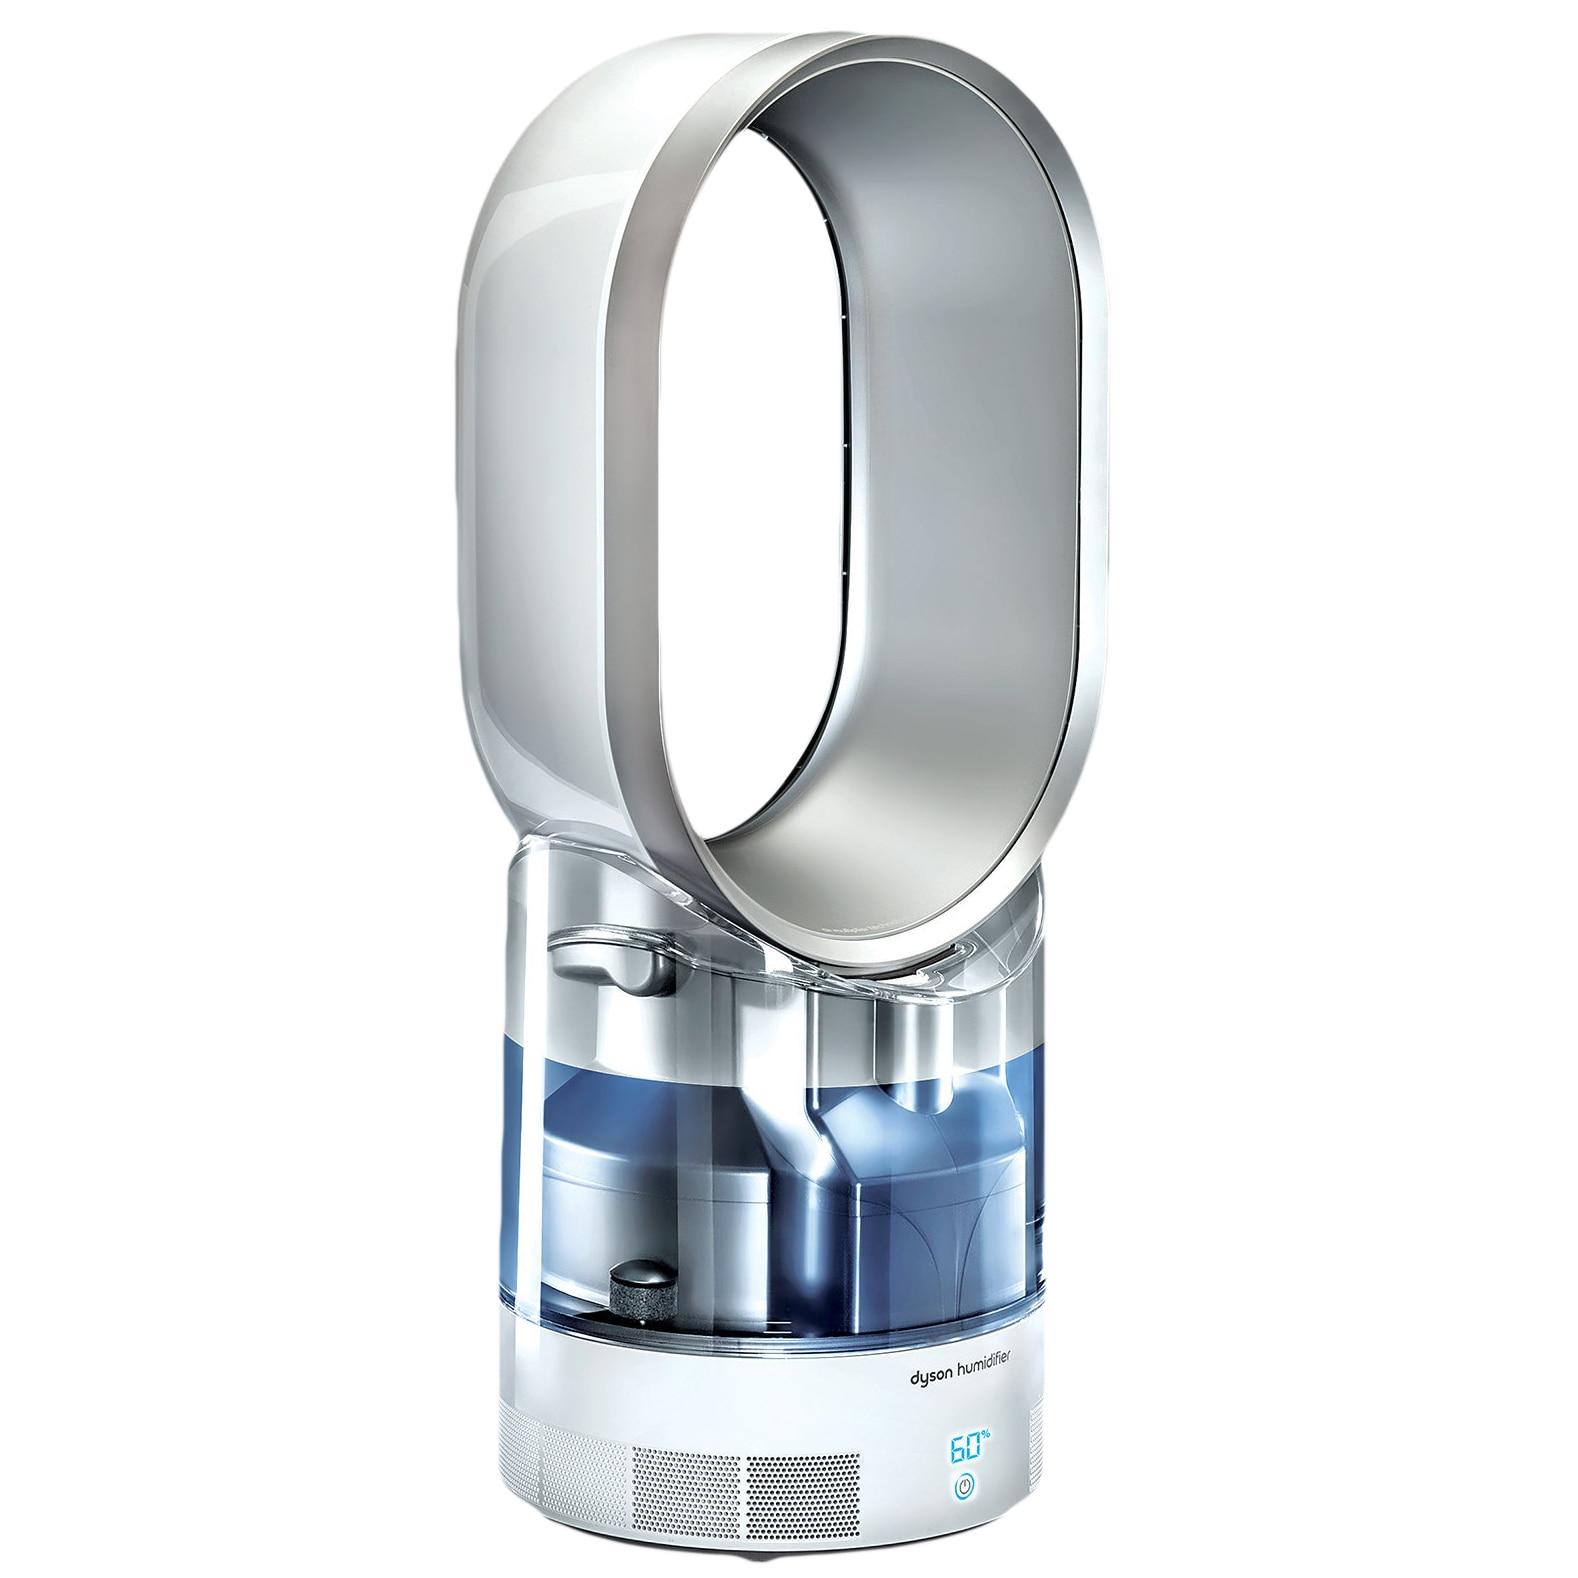 Fotografie Umidificator Dyson AM10, Ultraviolet Cleanse, 10 nivele de filtrare, alb / argintiu